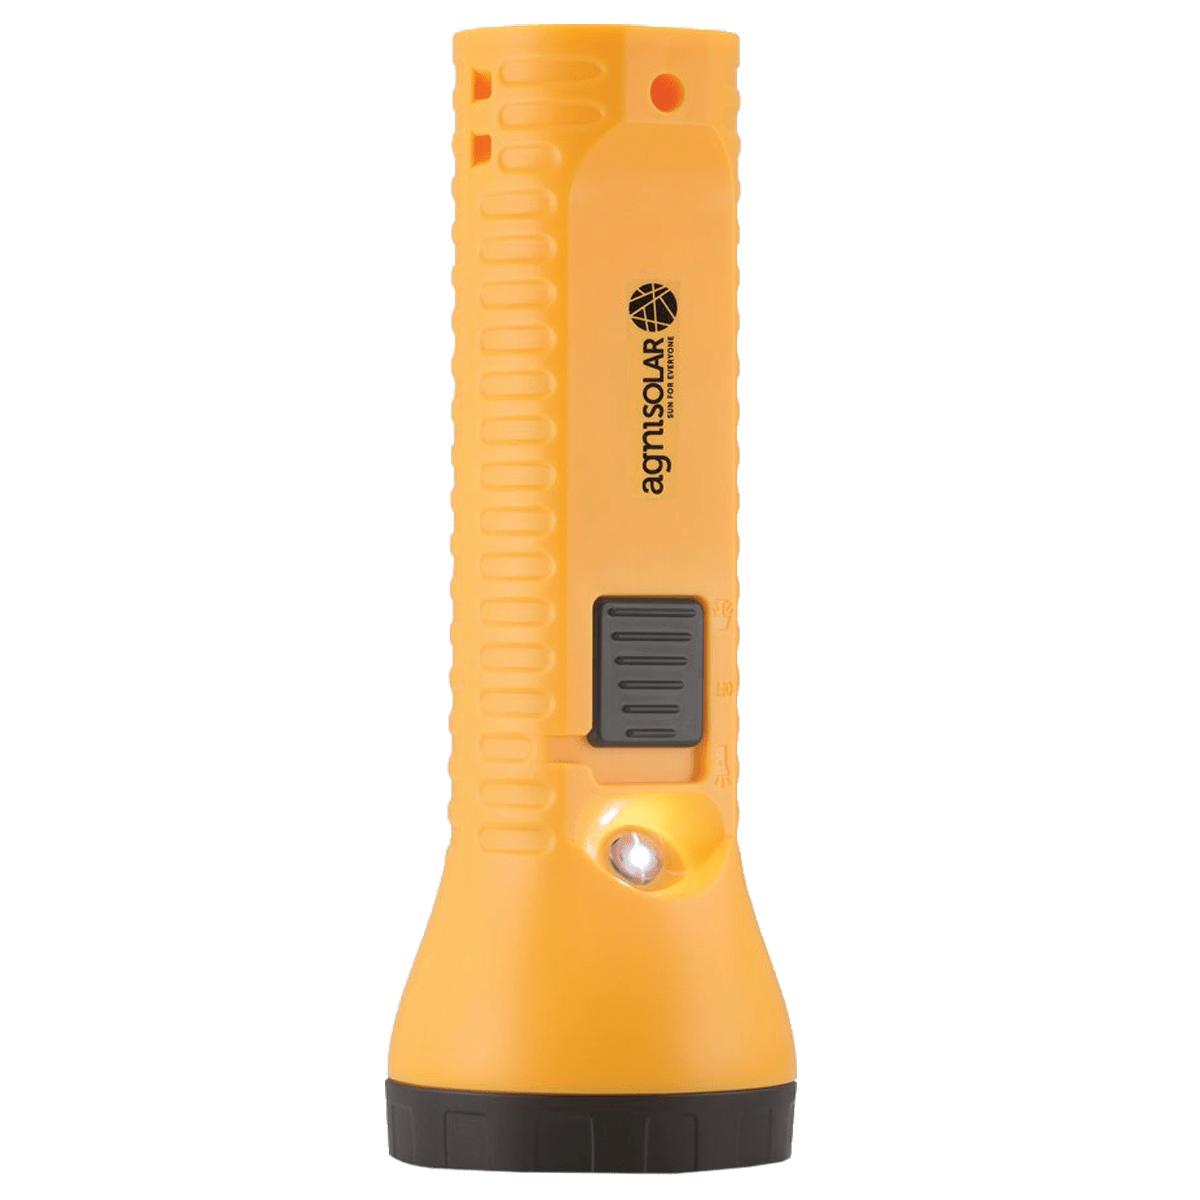 Agni Solar Torch 2 0.2 Watts Solar Torch (2 Brightness Modes, AG-202, Yellow)_1